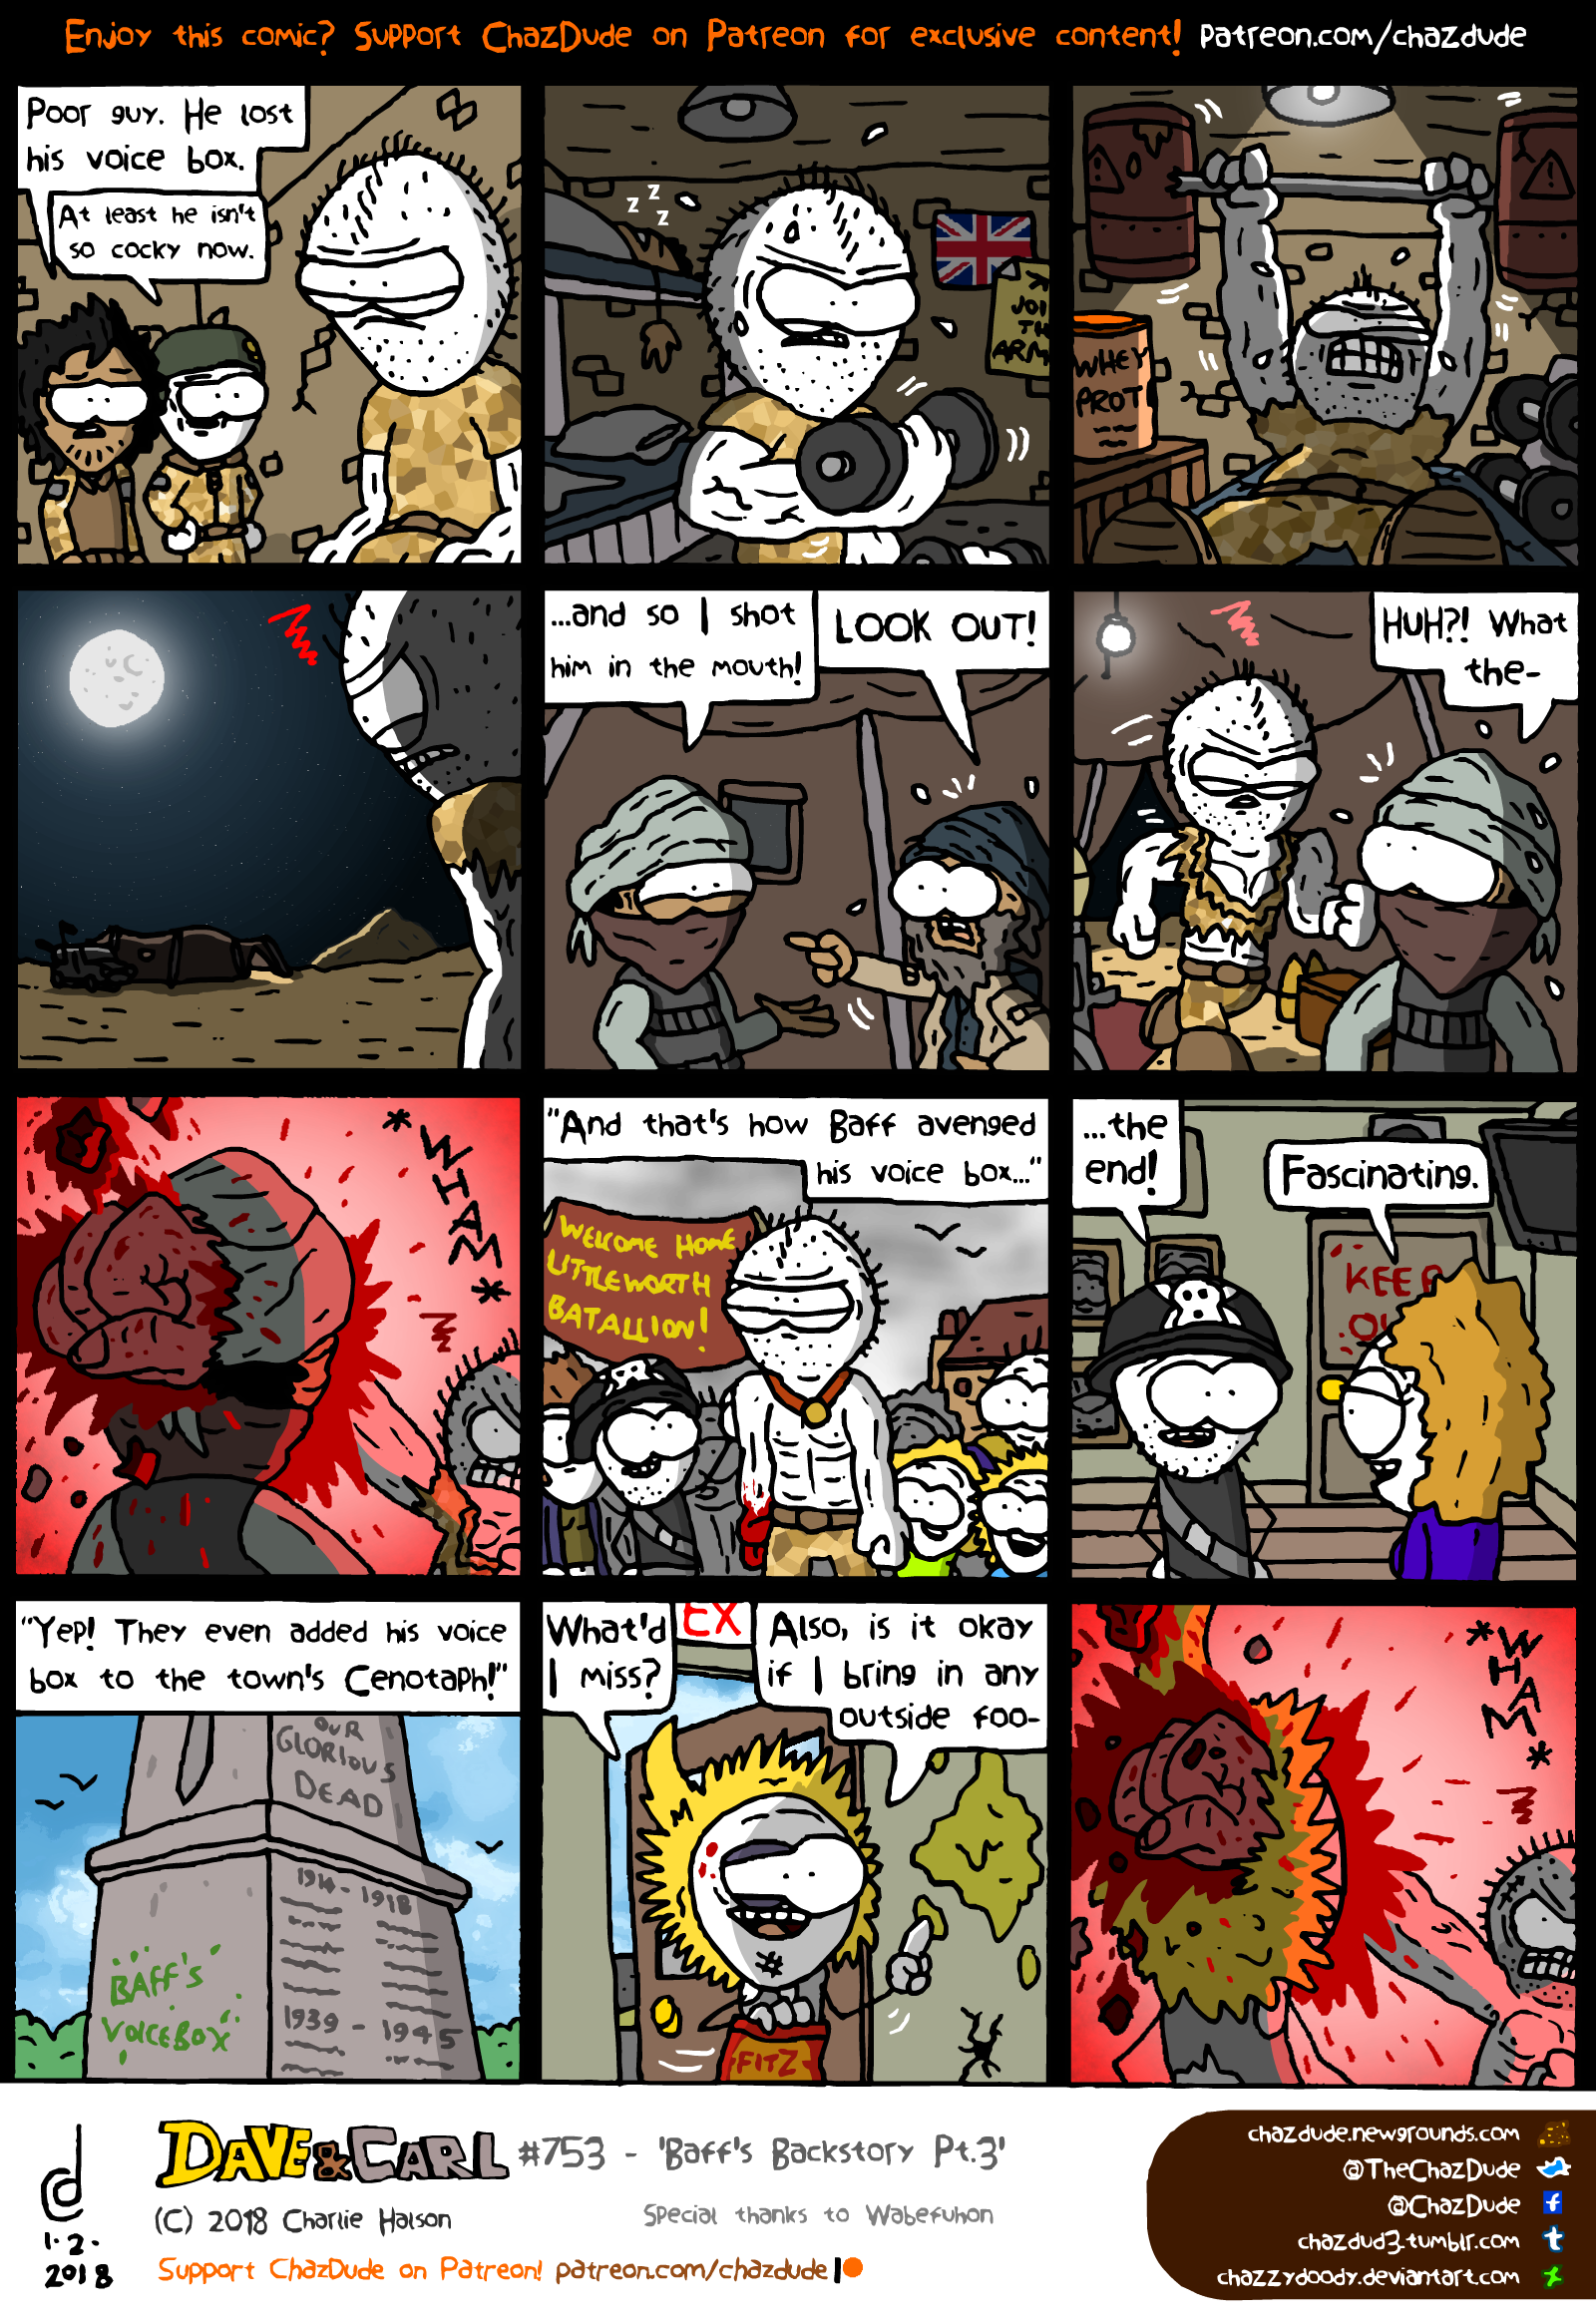 Baff's Backstory Pt.3